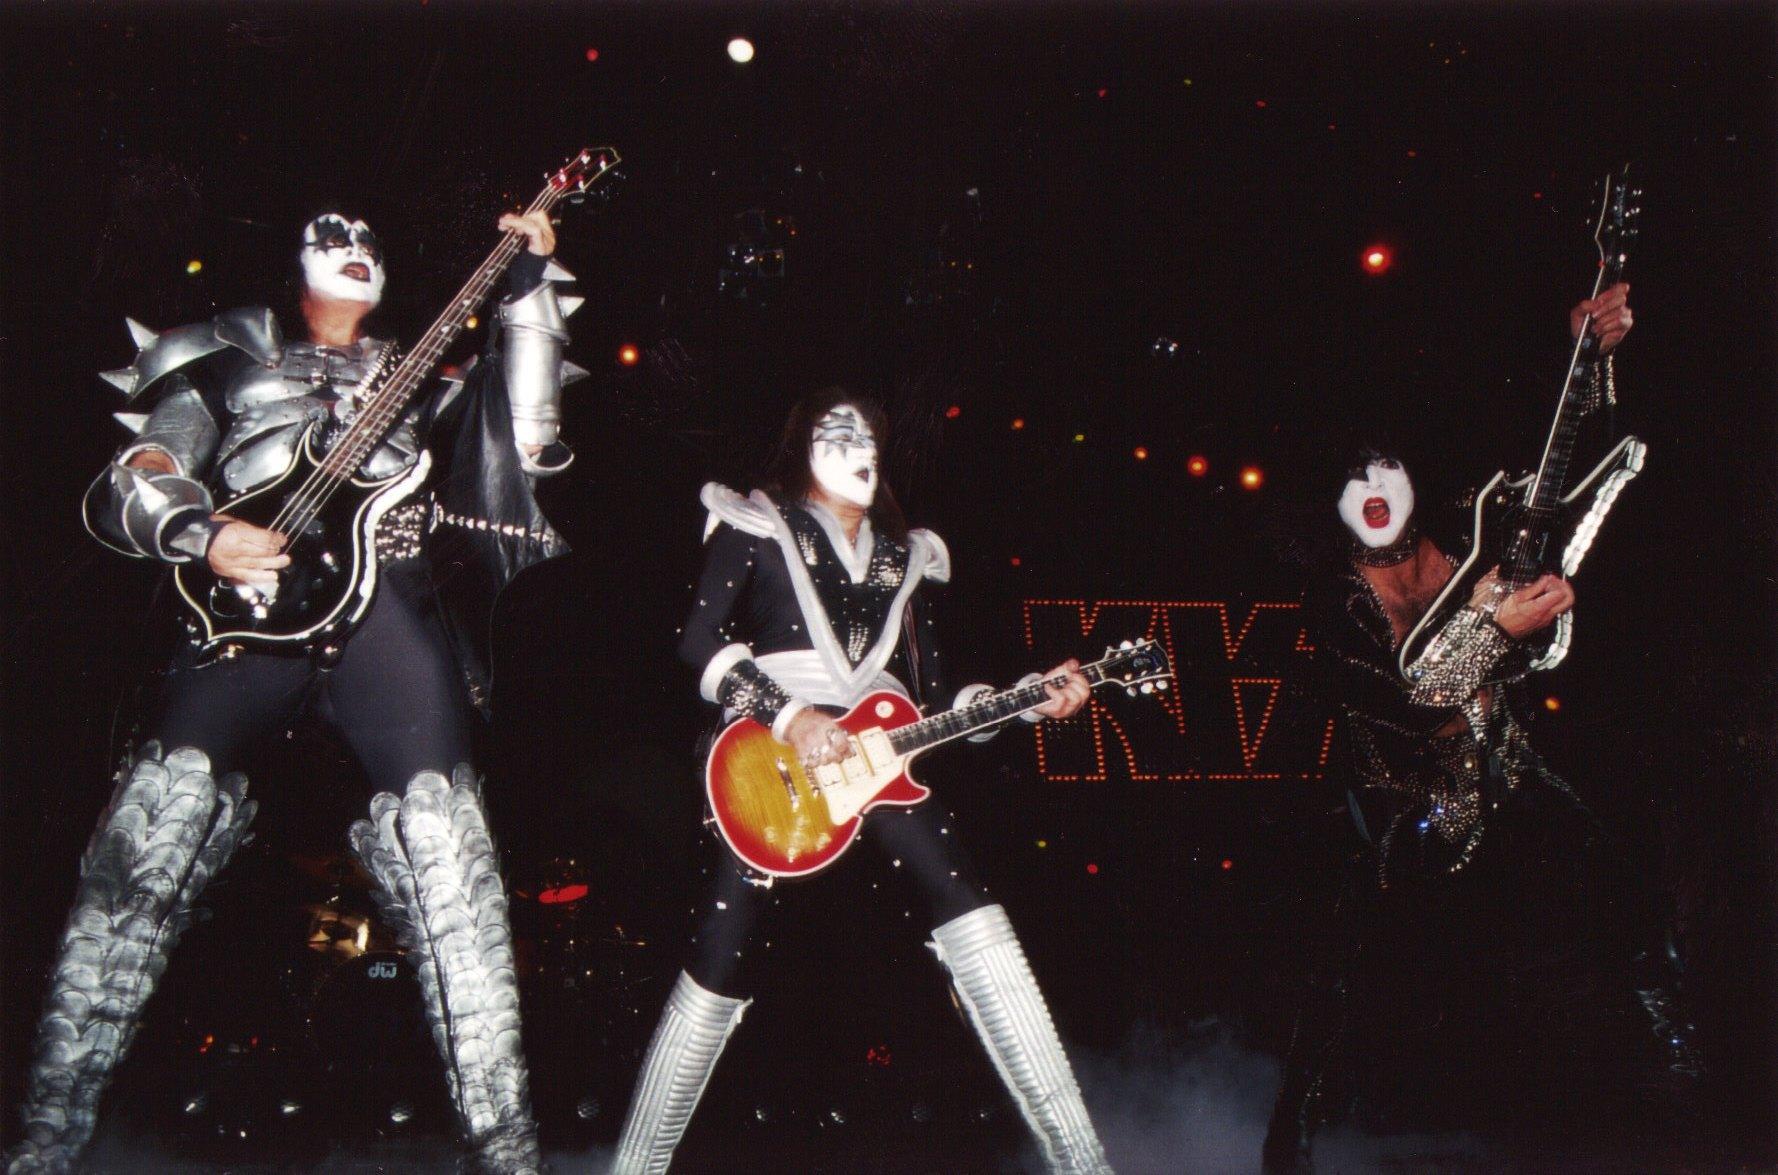 Kiss heavy metal rock bands concert guitar s wallpaper background 1778x1175